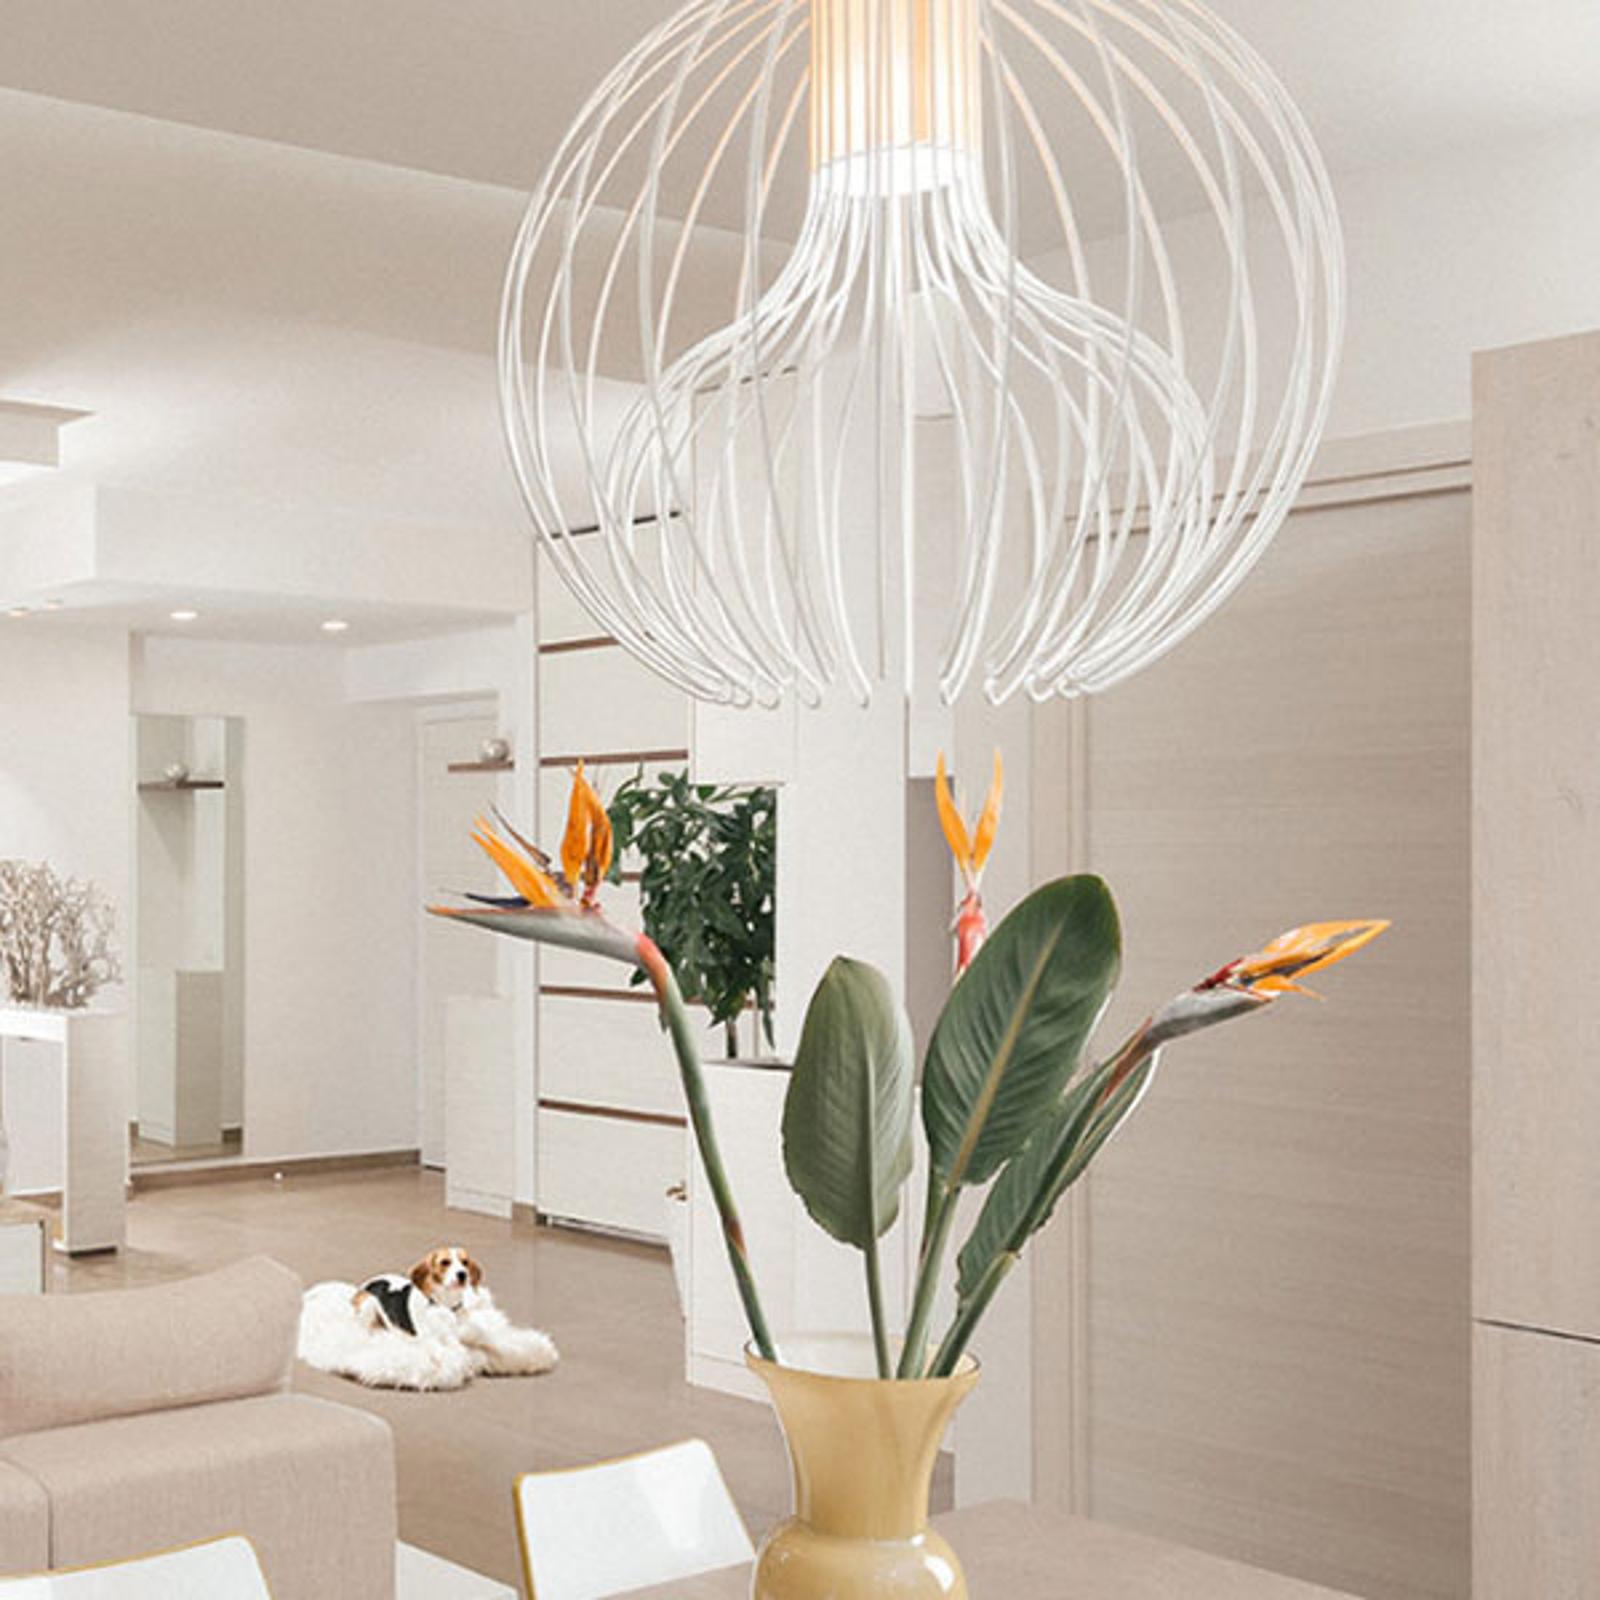 Modo Luce Icaro Ball lampa wisząca, biała, Ø 60 cm